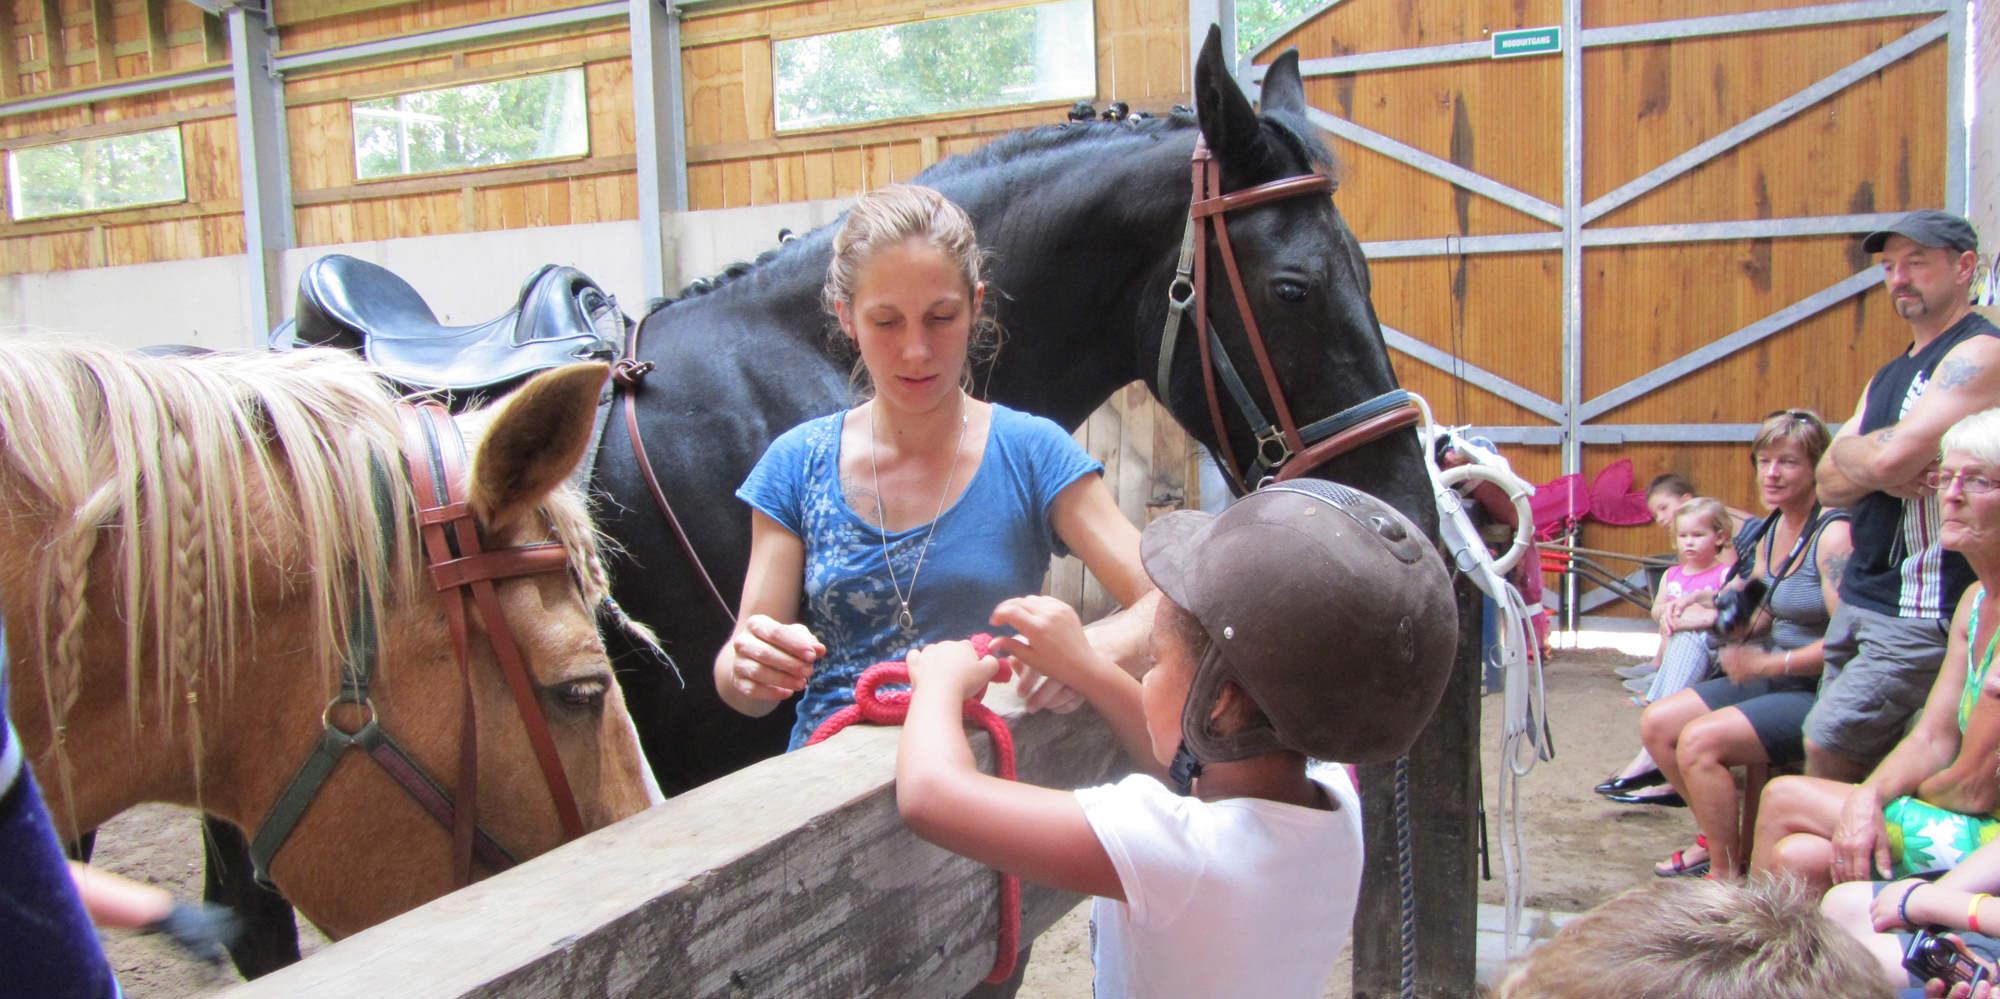 "<i class=""fa fa-child""></i> 27-31/07/2015 – Kinderkamp Zomervakantie Juli"